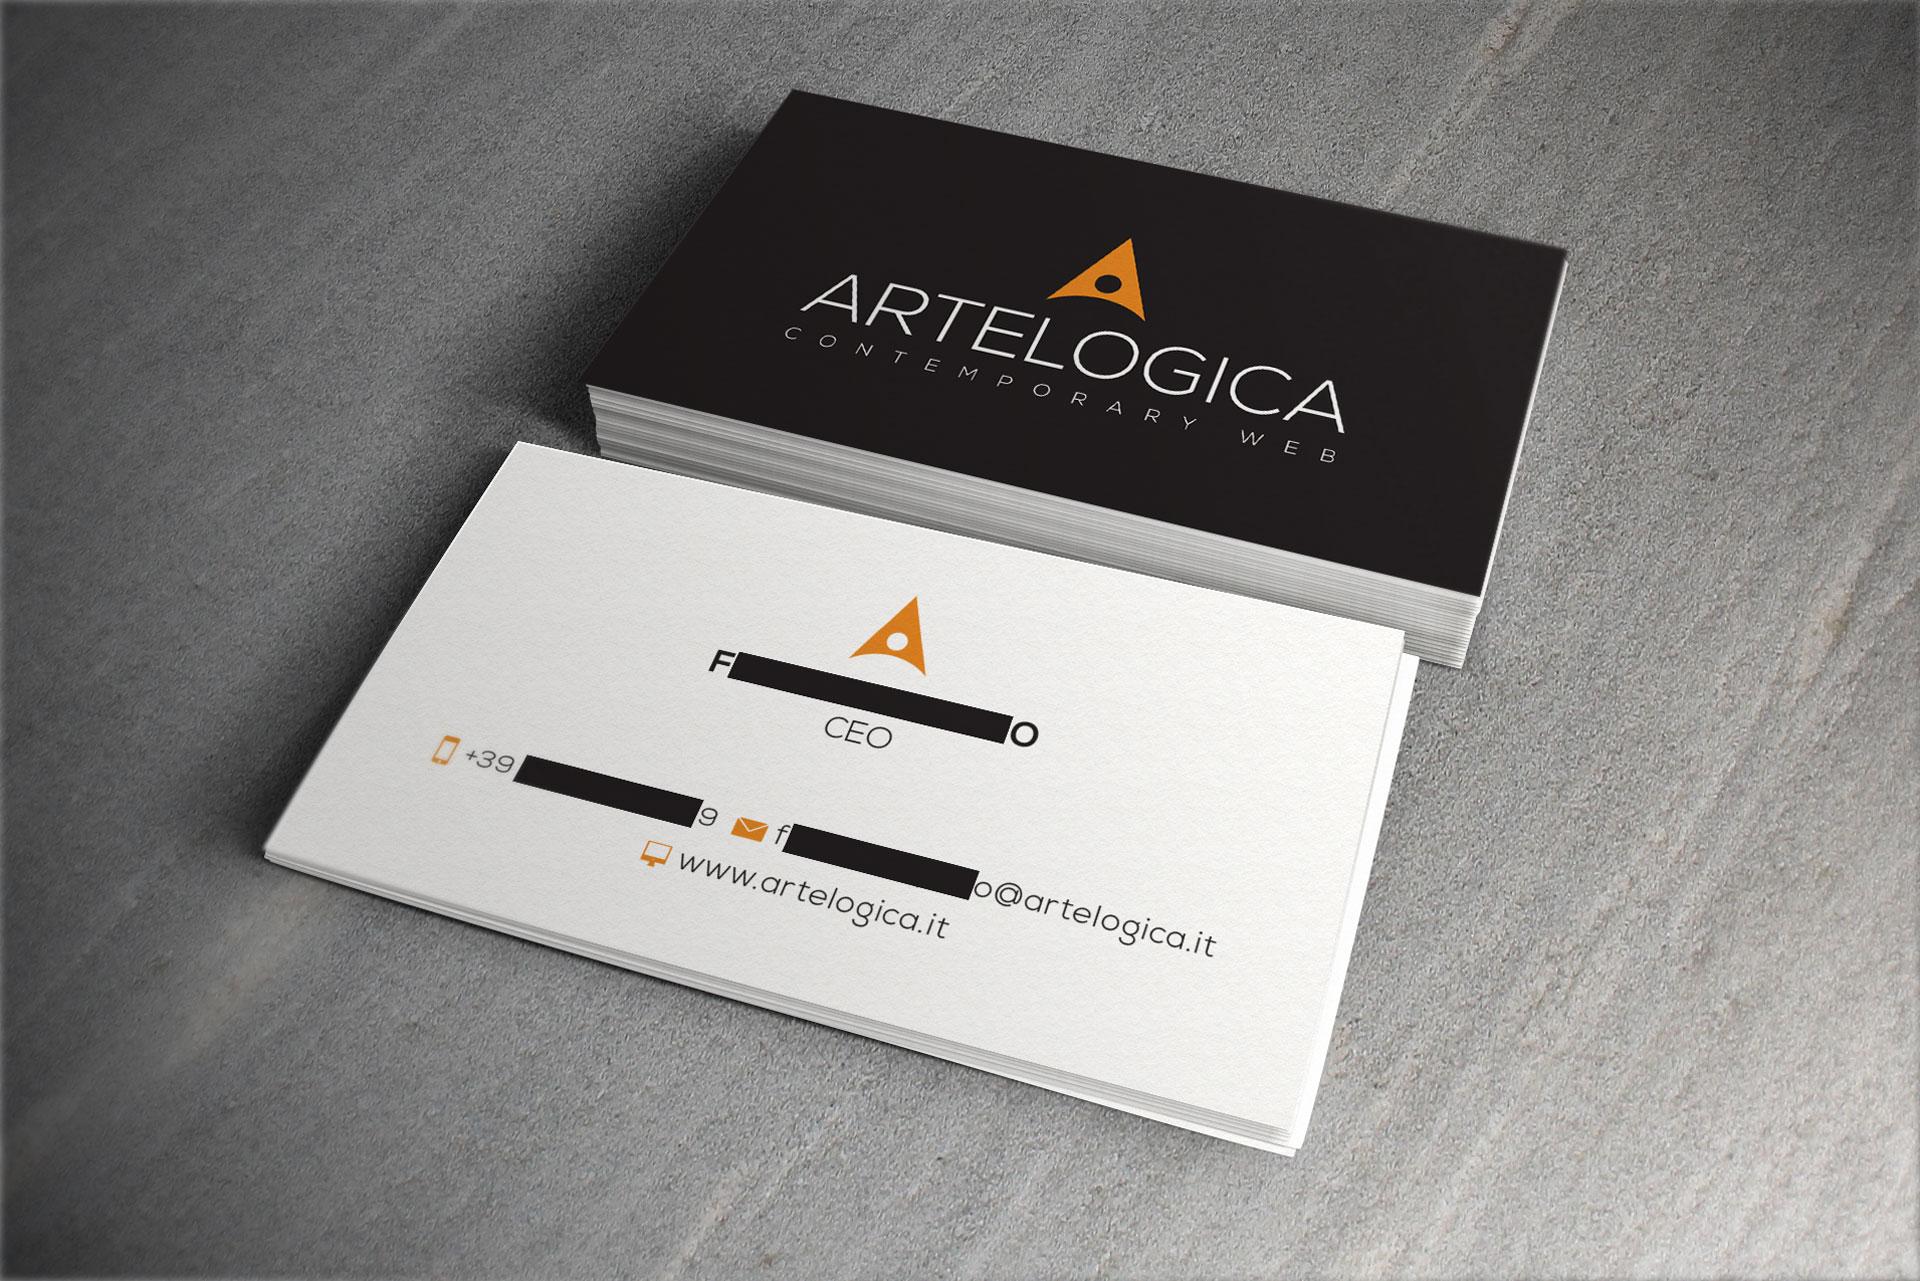 artelogica-web-agency-novara-bv